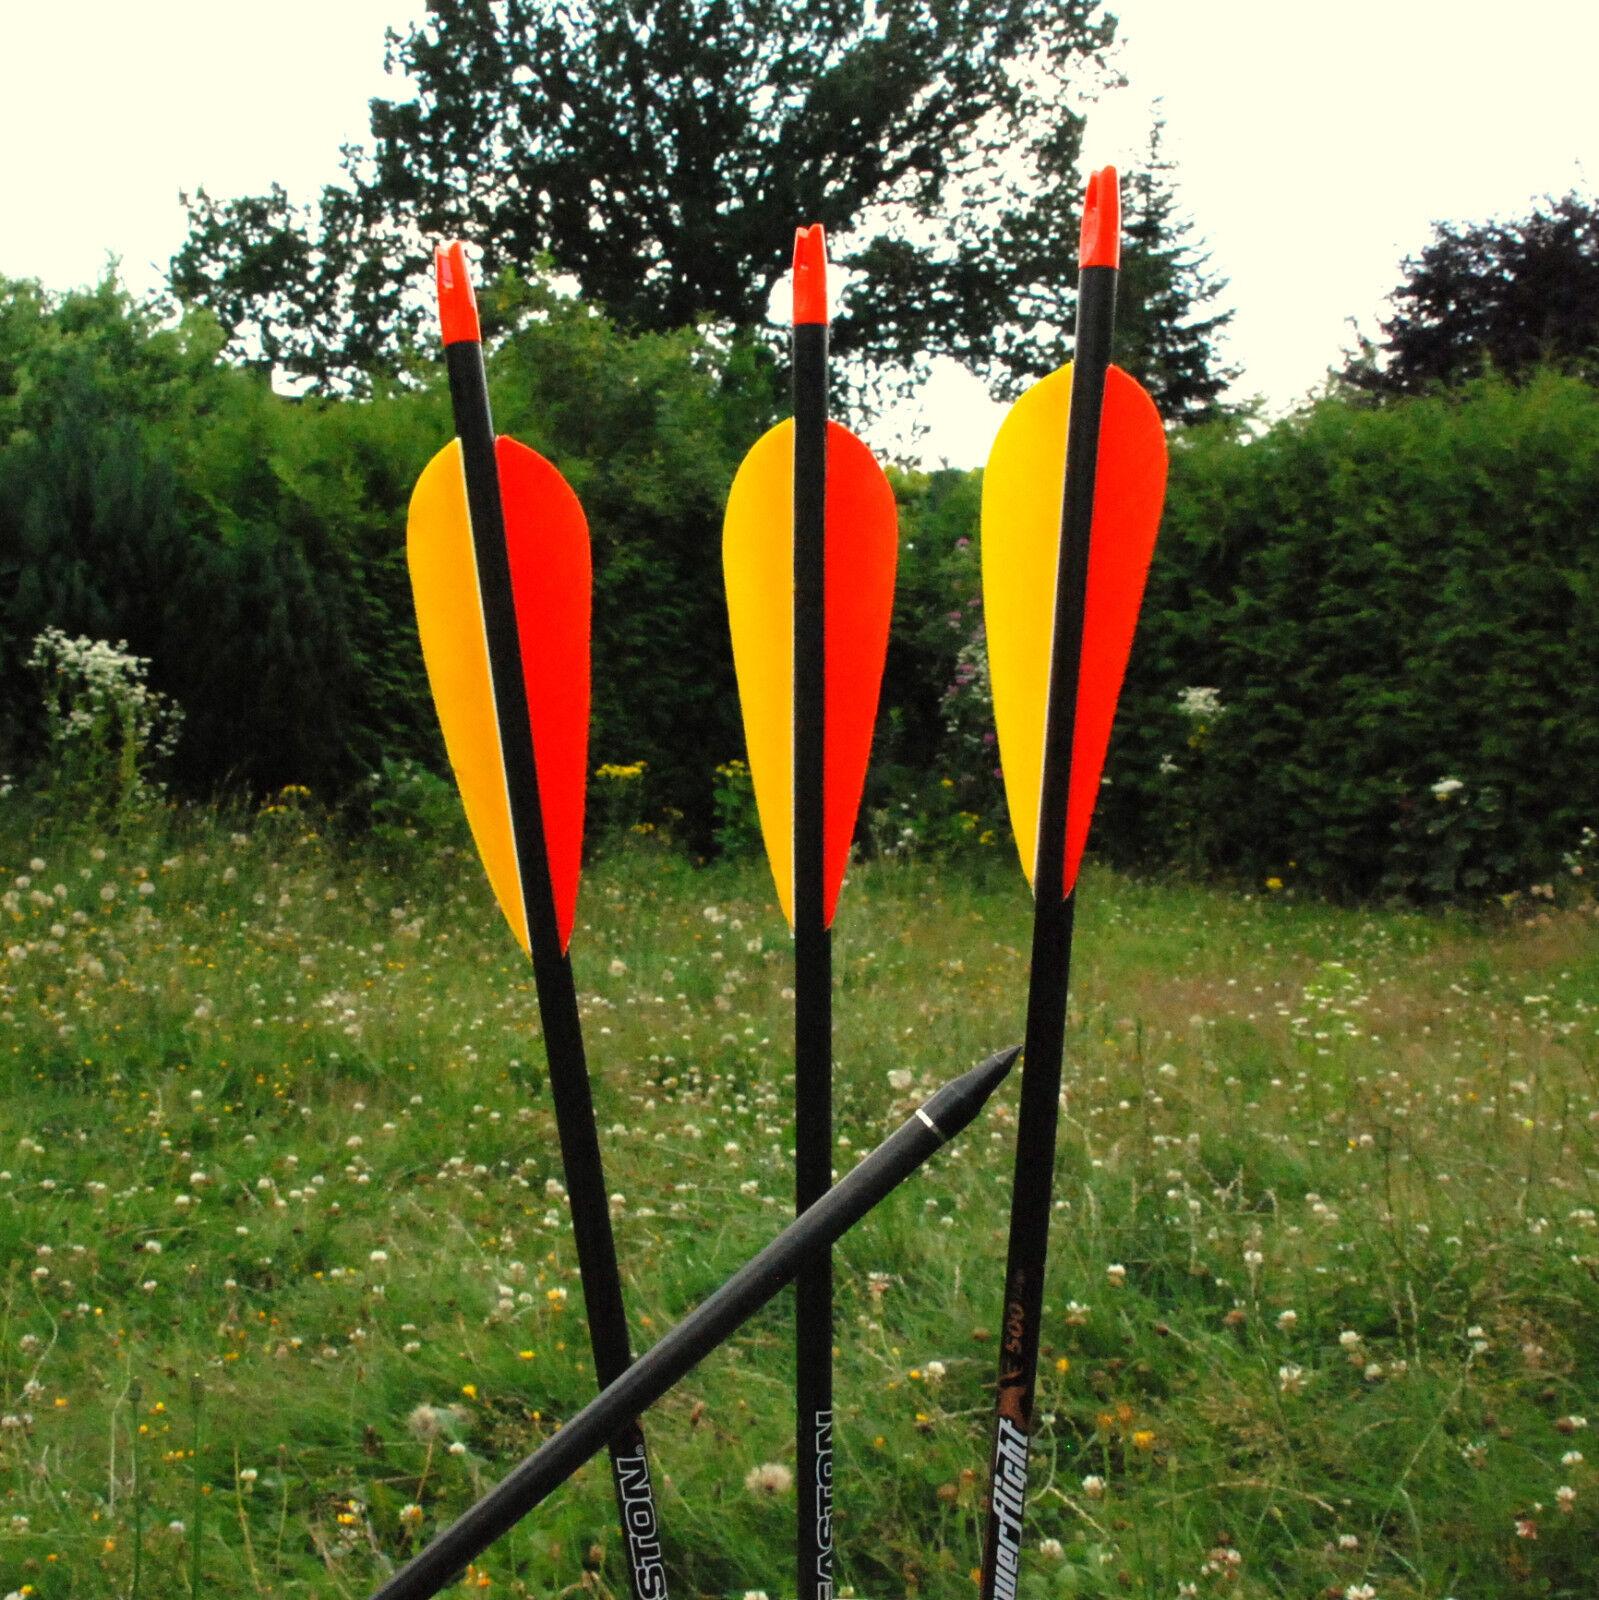 6 Carbonpfeile Easton Powerflight mit Naturfedern